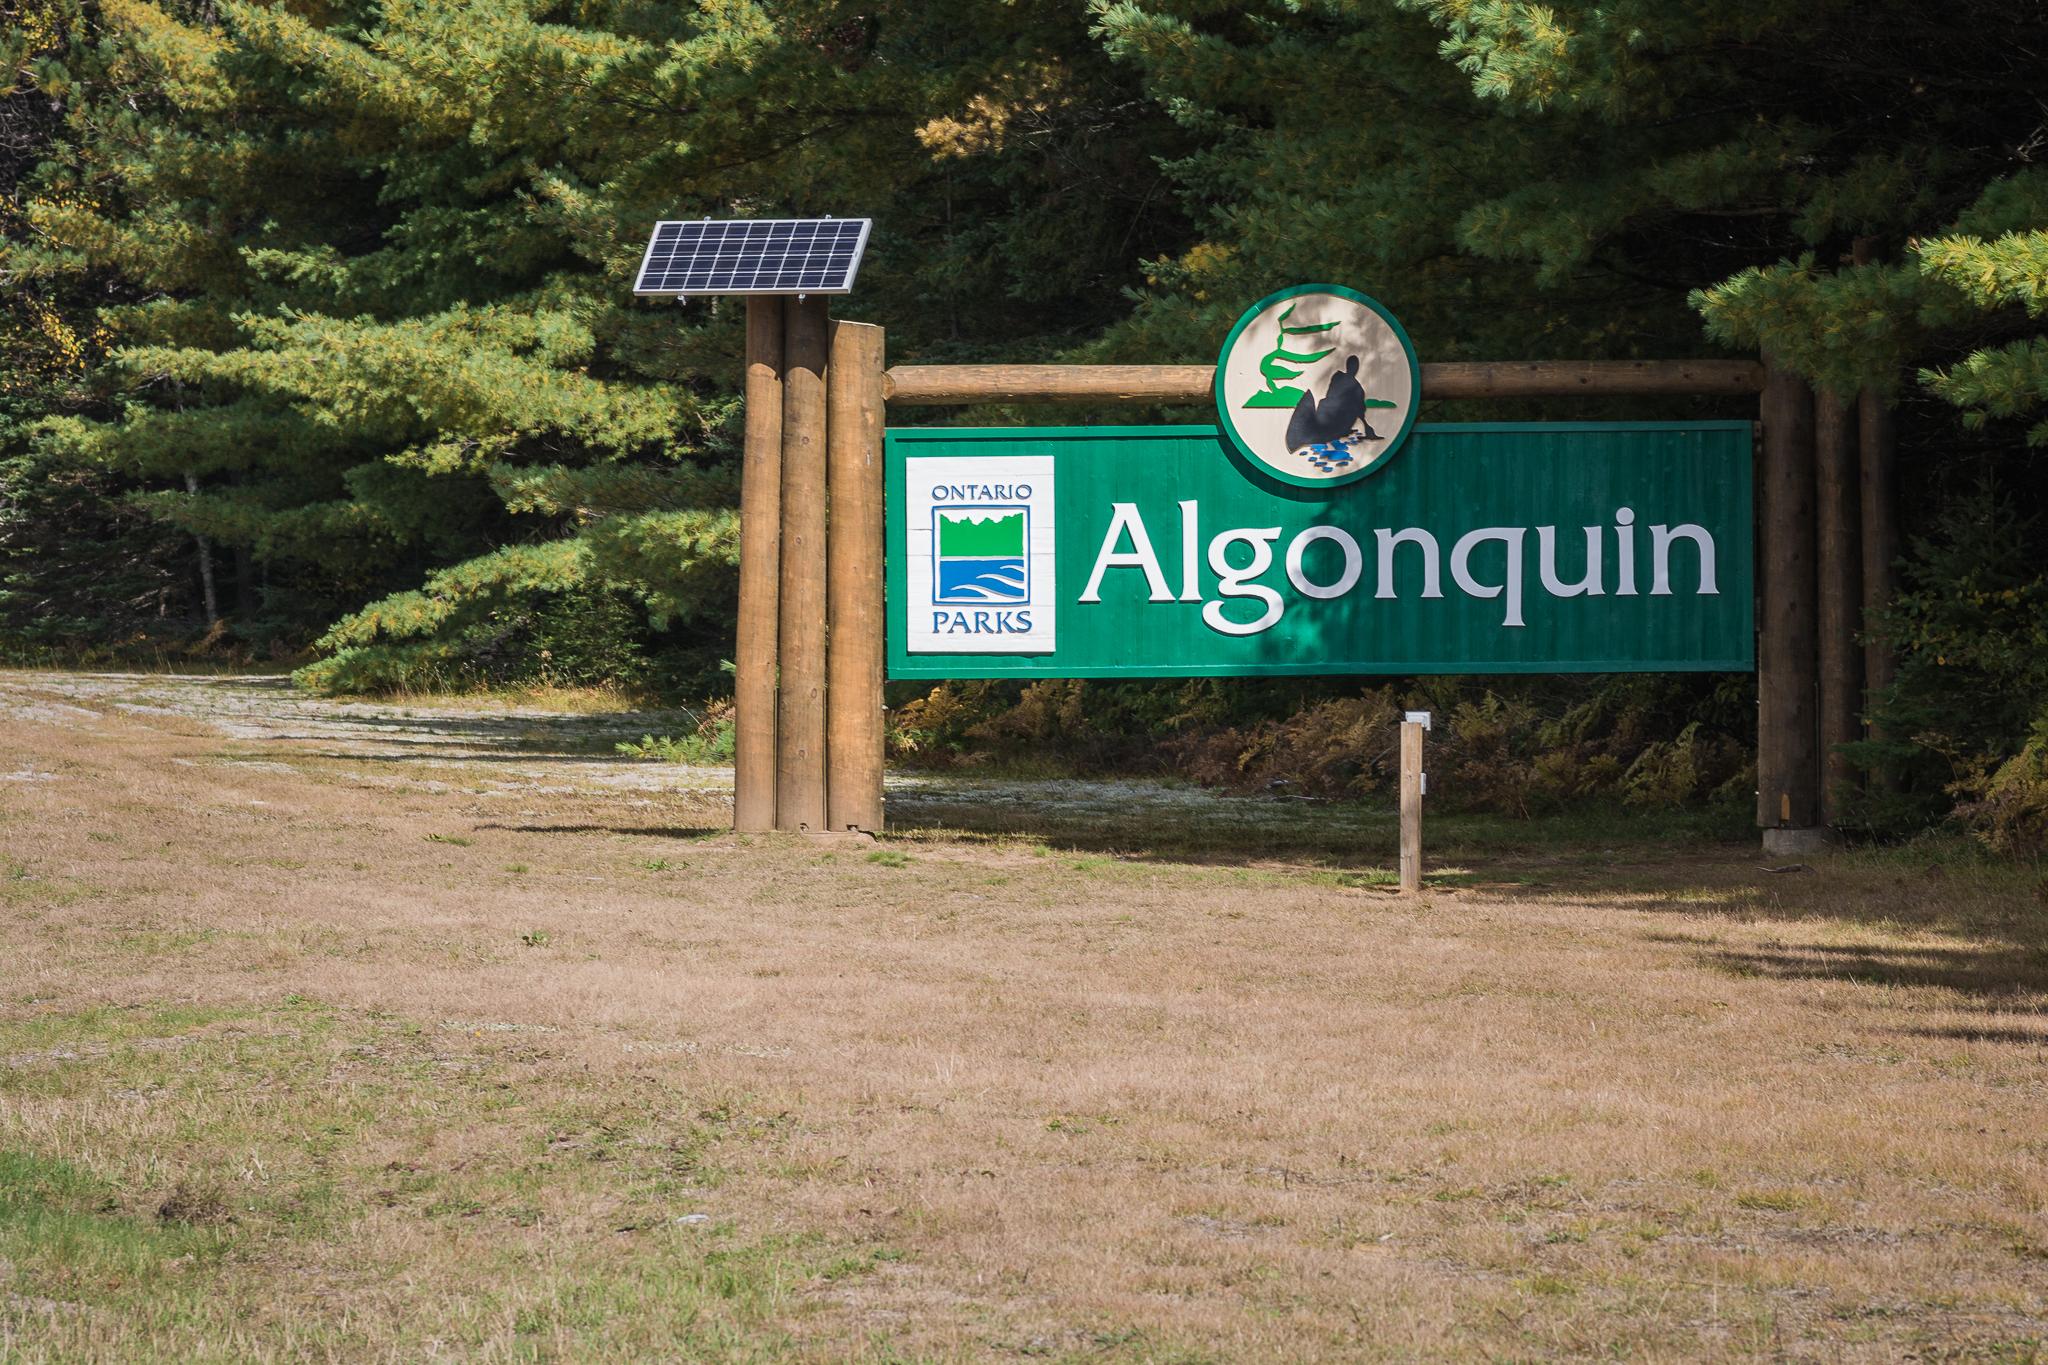 Algonquin Provincial Park (1/125s, f/8, ISO200)